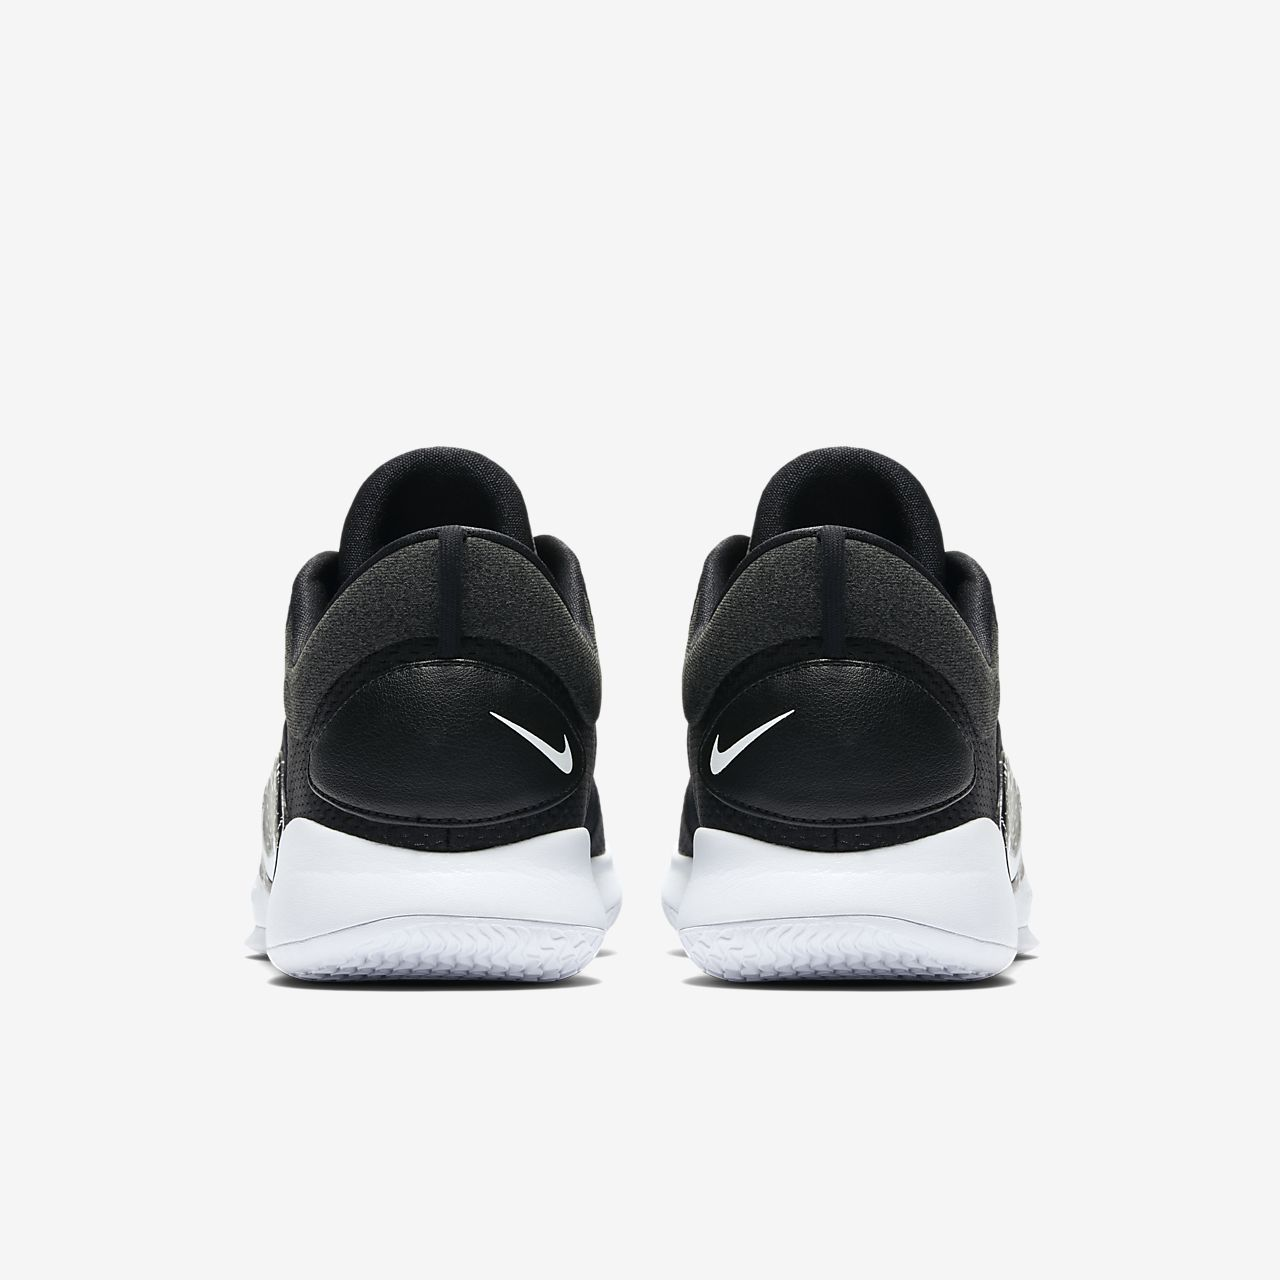 6bc18d0bf30 Nike Hyperdunk X Low Basketball Shoe. Nike.com GB